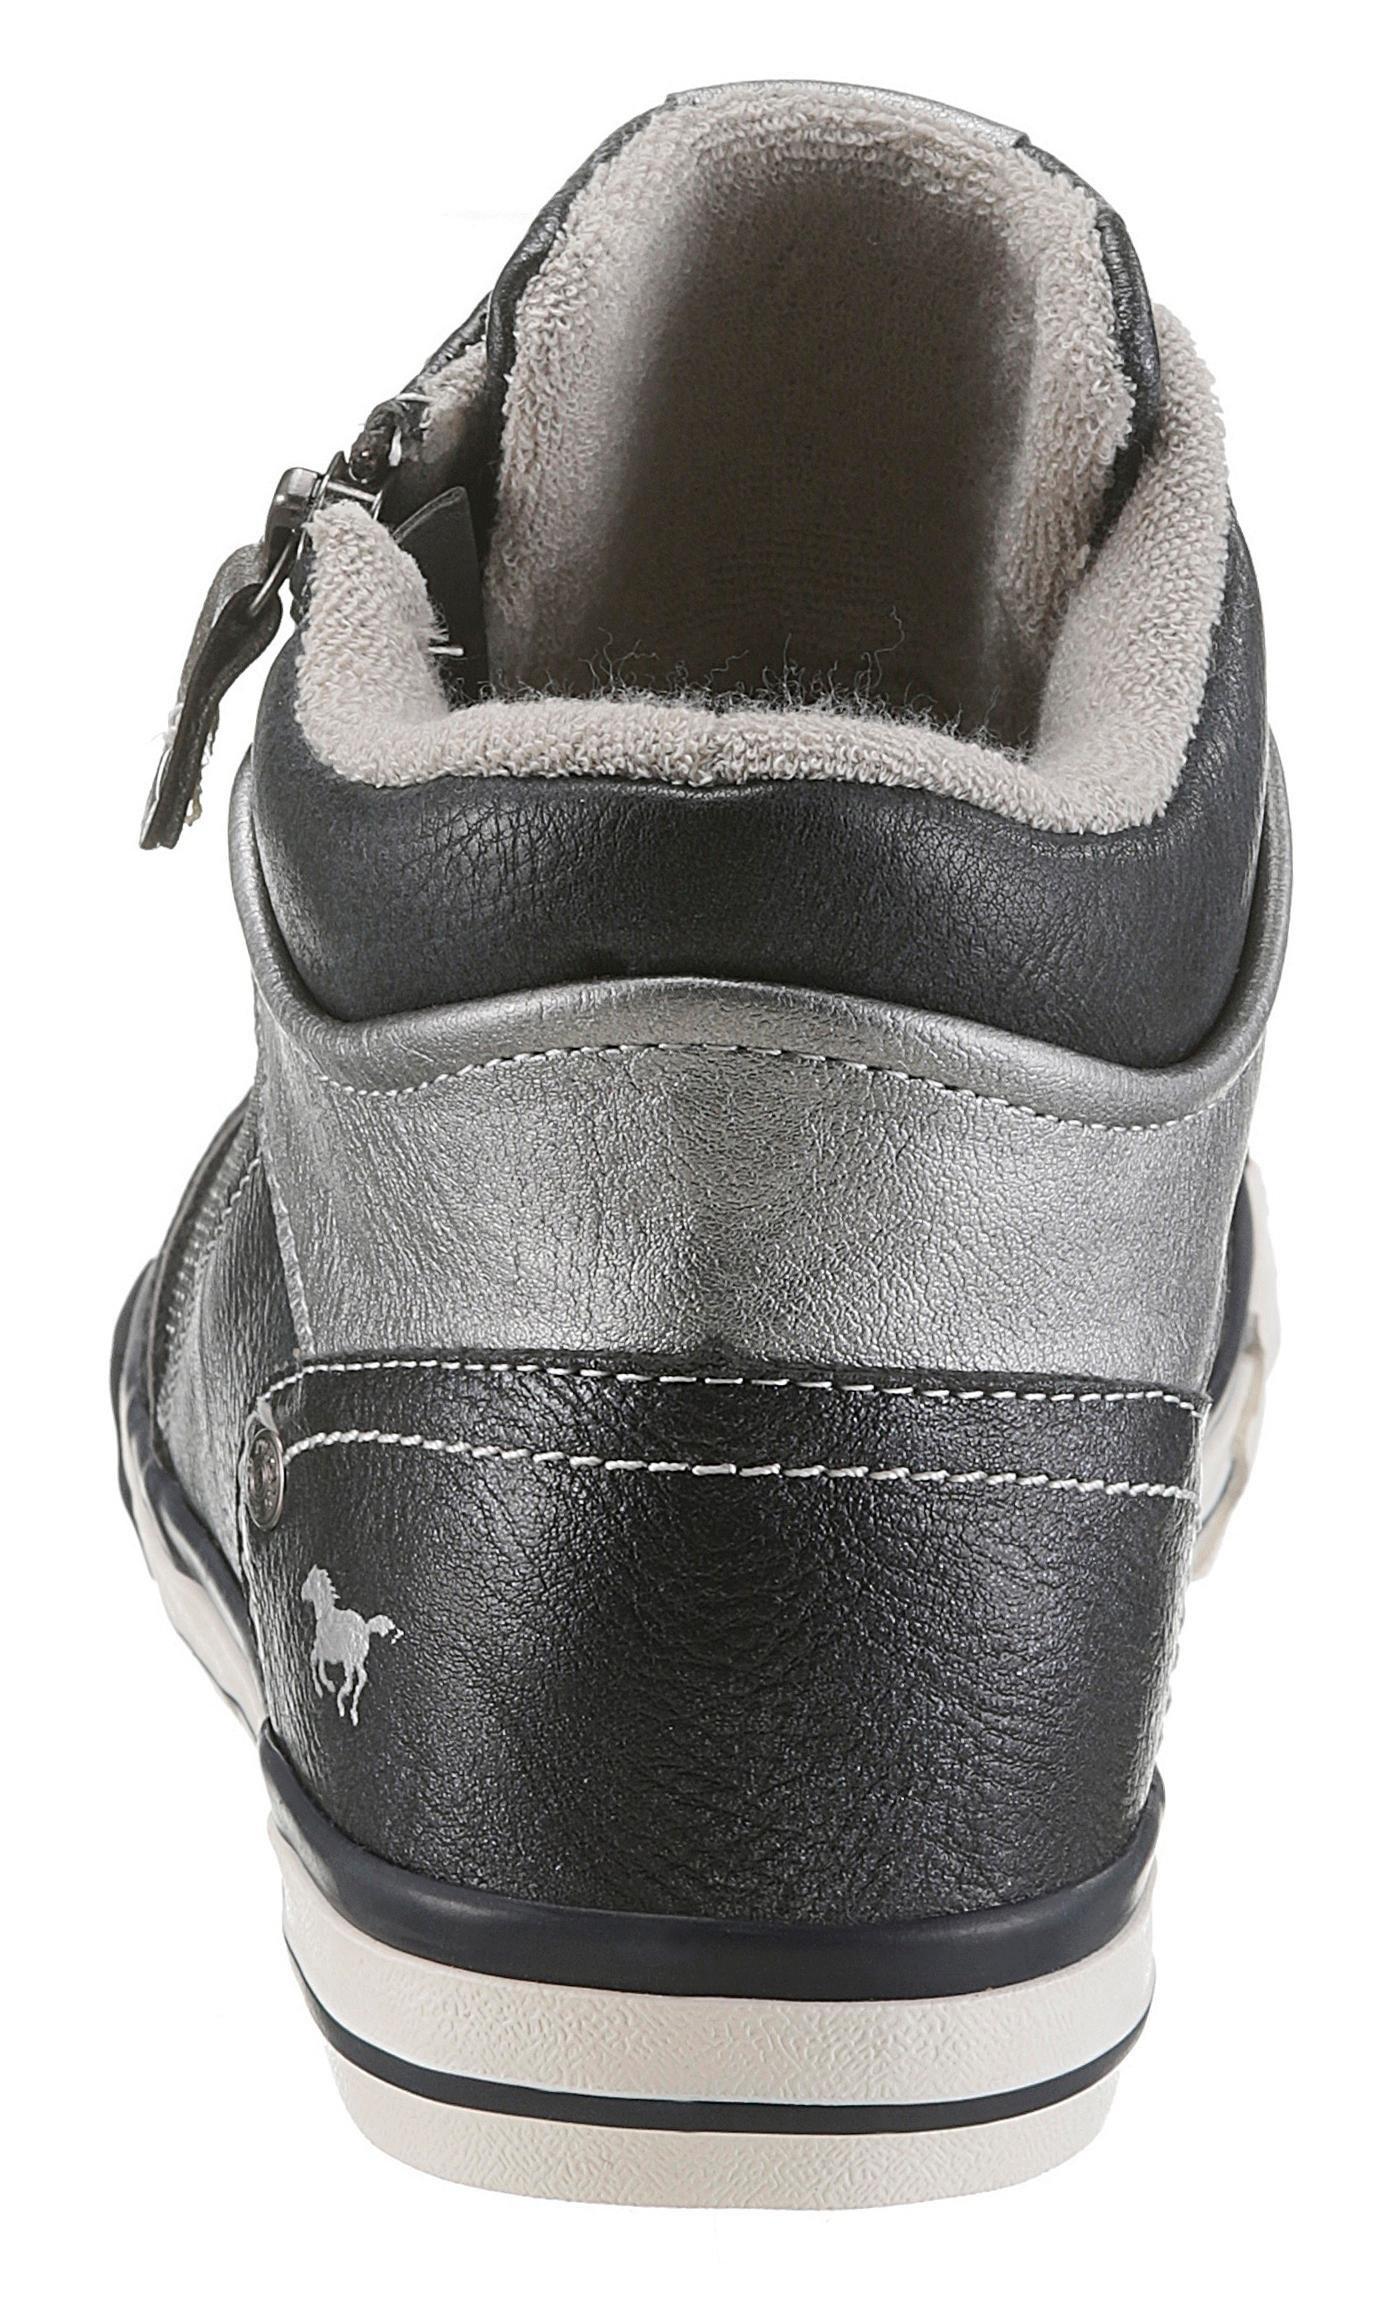 Shoes Verkrijgbaar Mustang Sneakers Online Mustang Shoes PkwXZOTiul